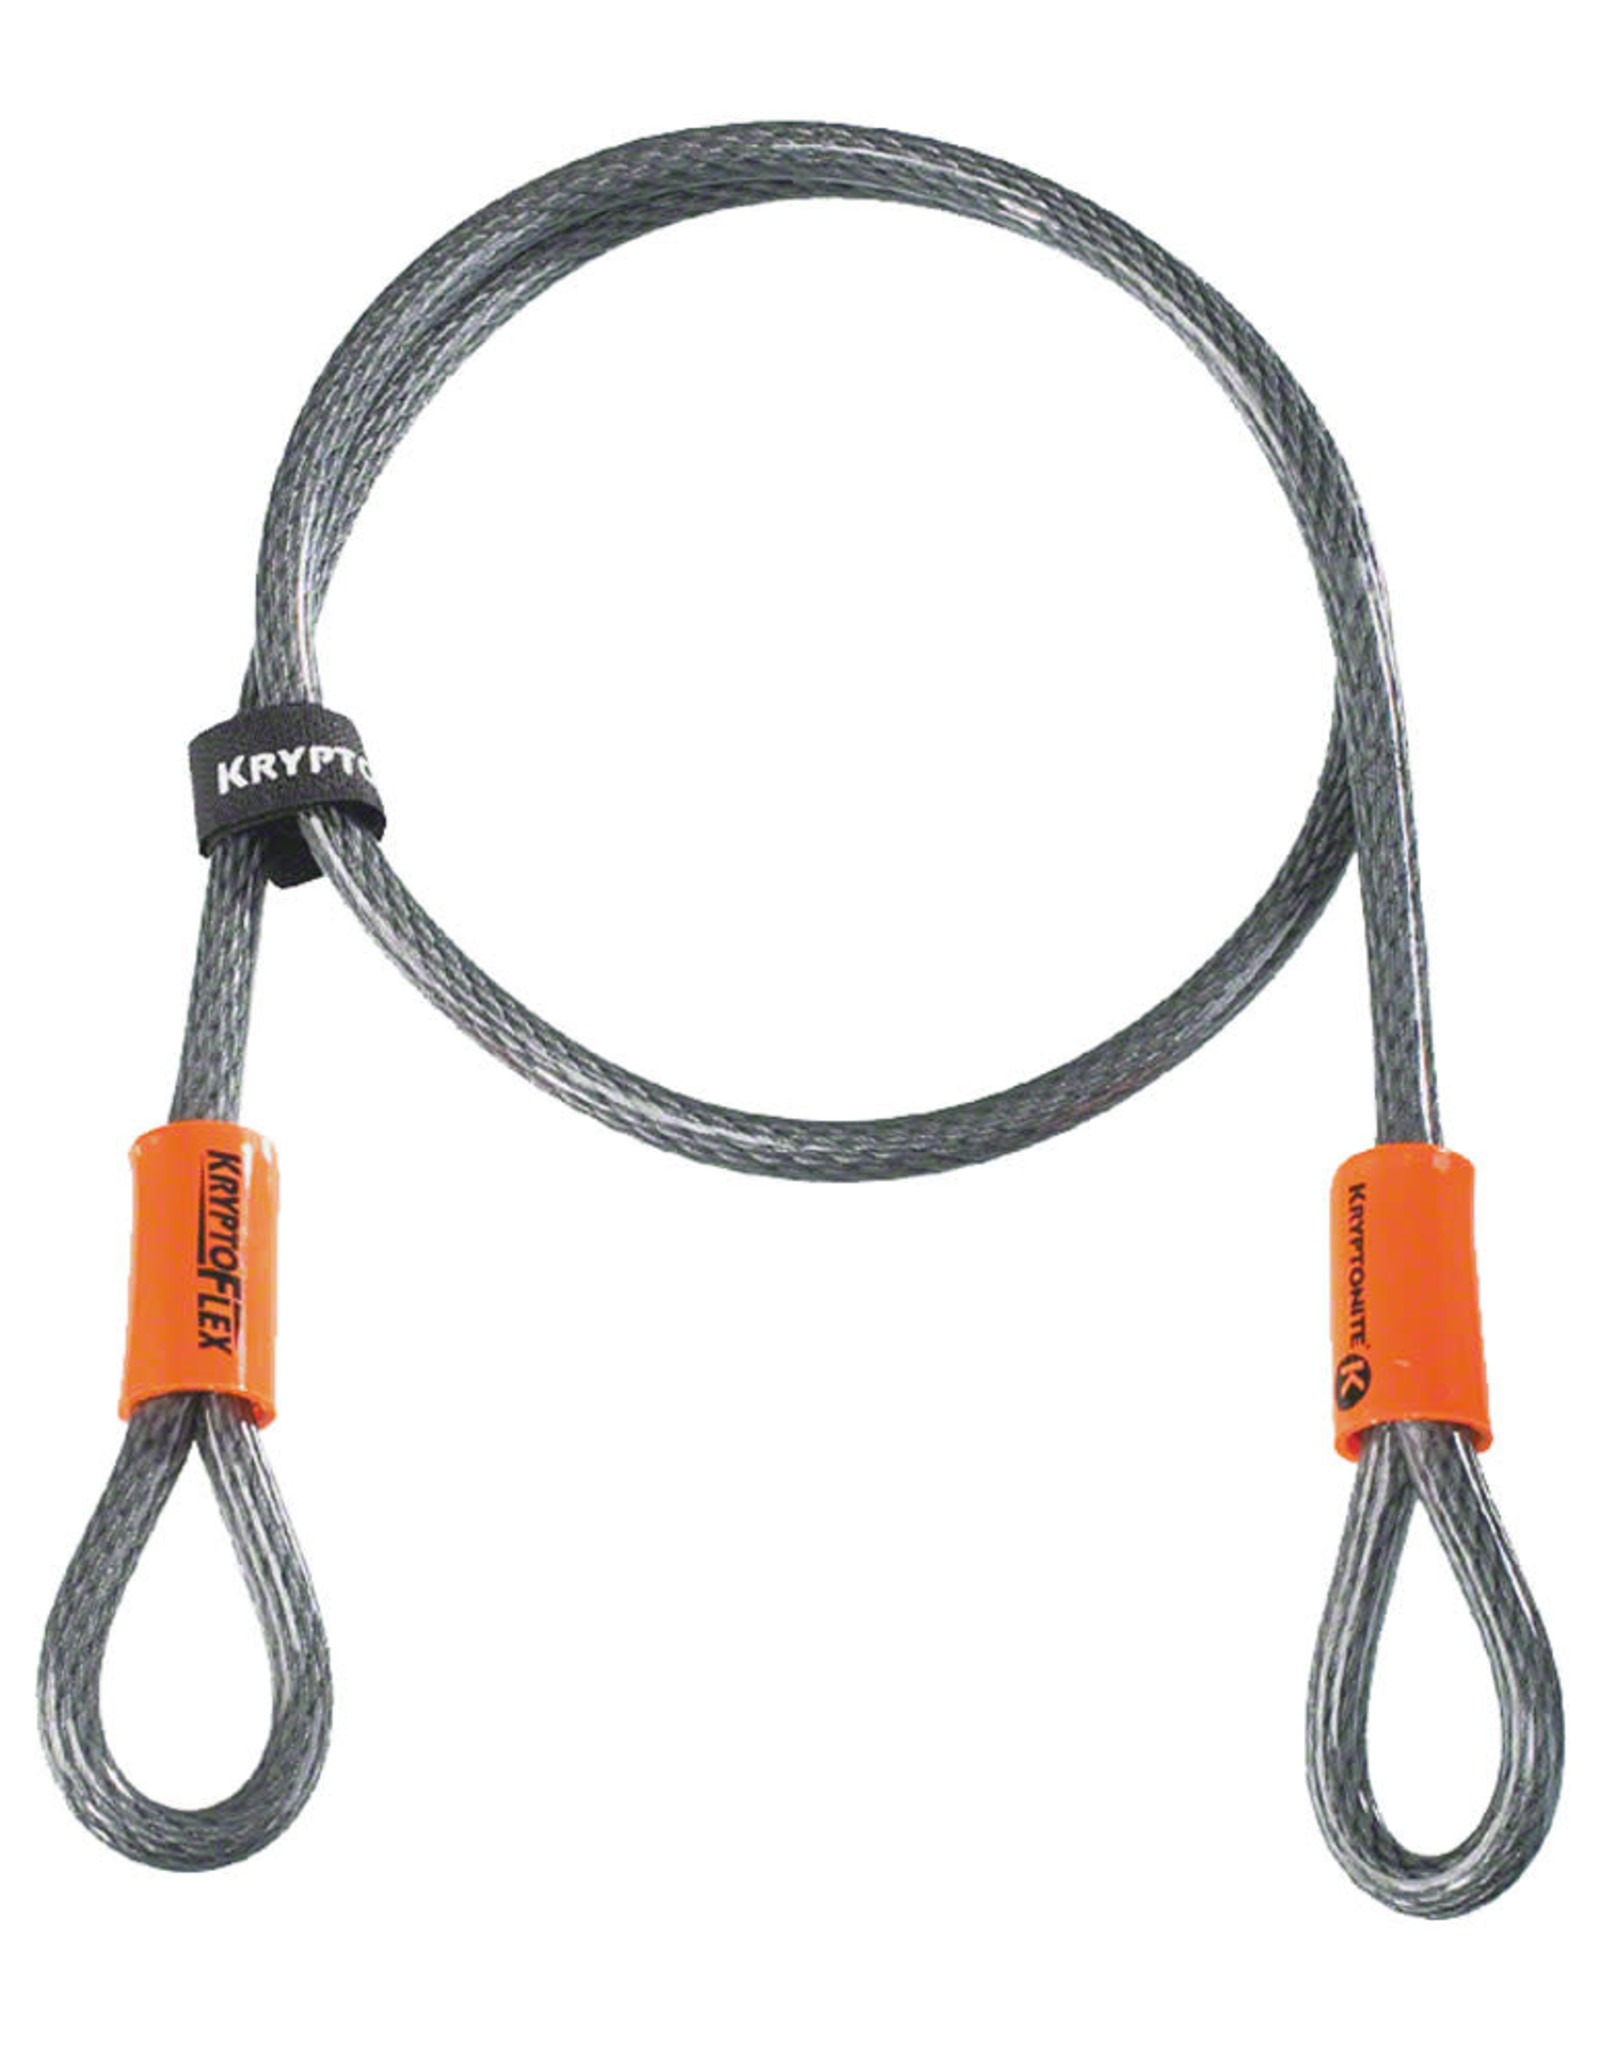 Kryptonite Kryptonite KryptoFlex 1007 Cable 7' x 10mm